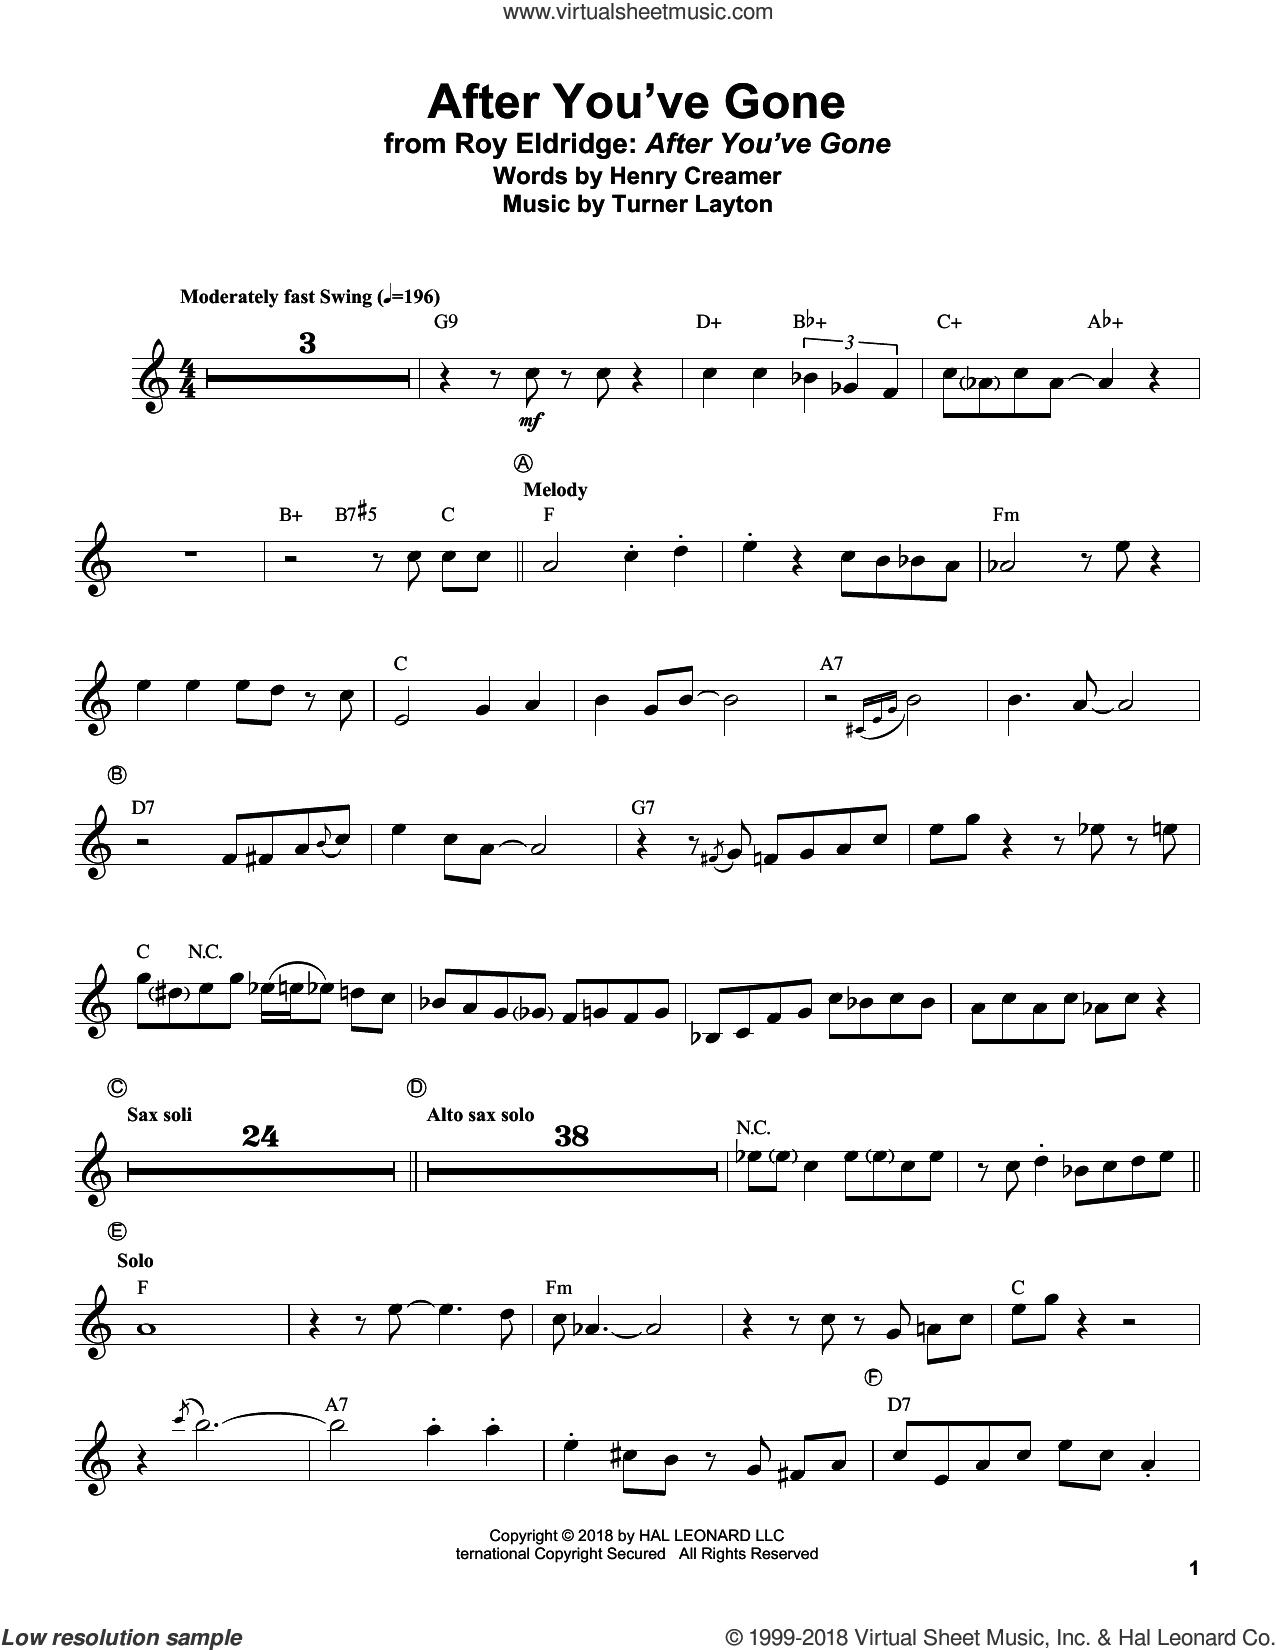 After You've Gone sheet music for trumpet solo (transcription) by Sophie Tucker, Roy Eldridge, Henry Creamer and Turner Layton, intermediate trumpet (transcription)